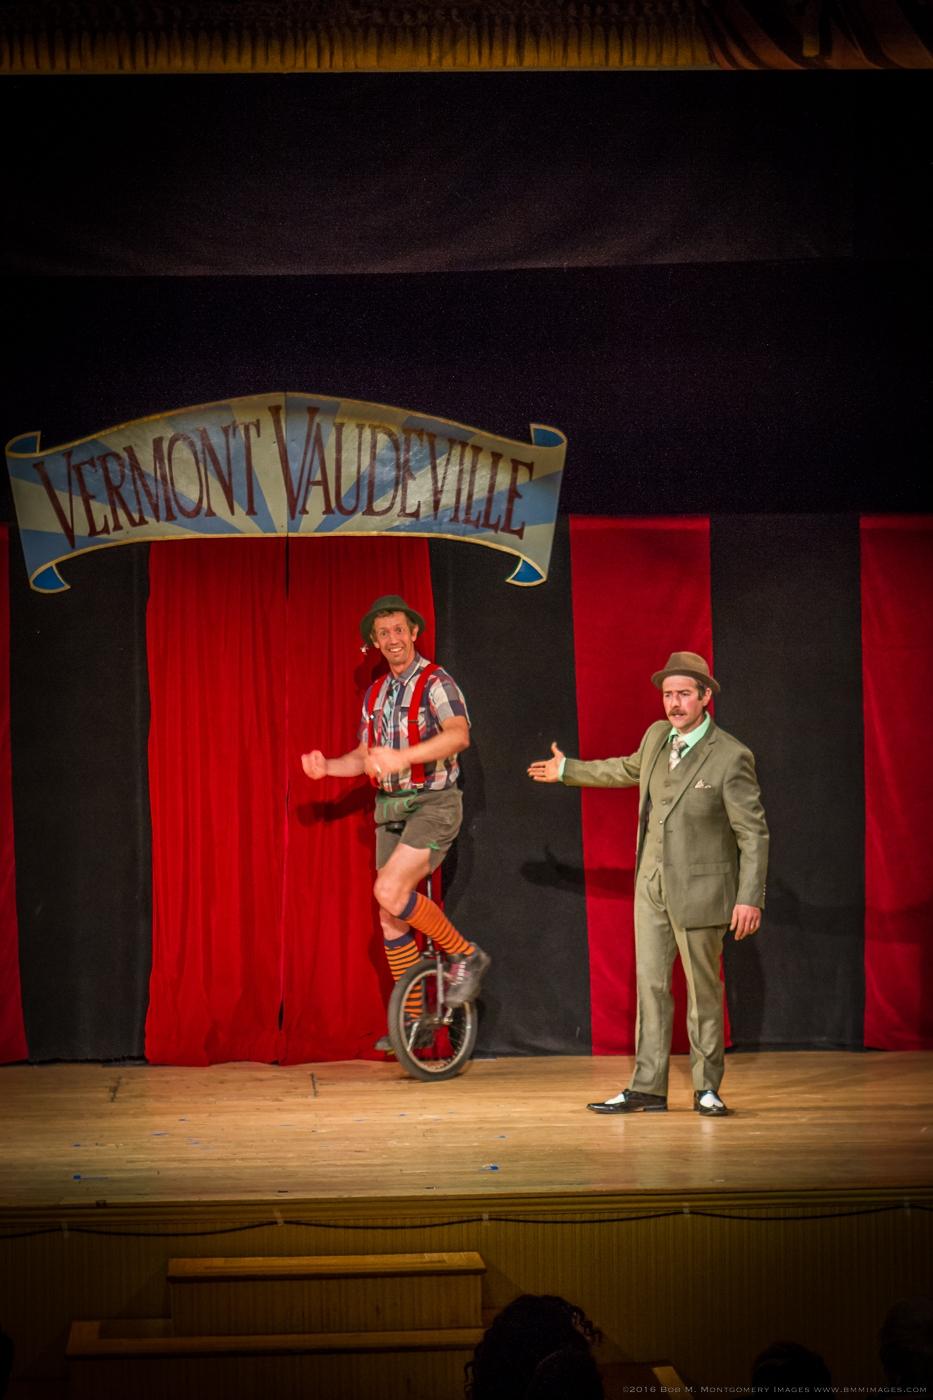 Vermont Vaudeville 20160513 - 0034.jpg